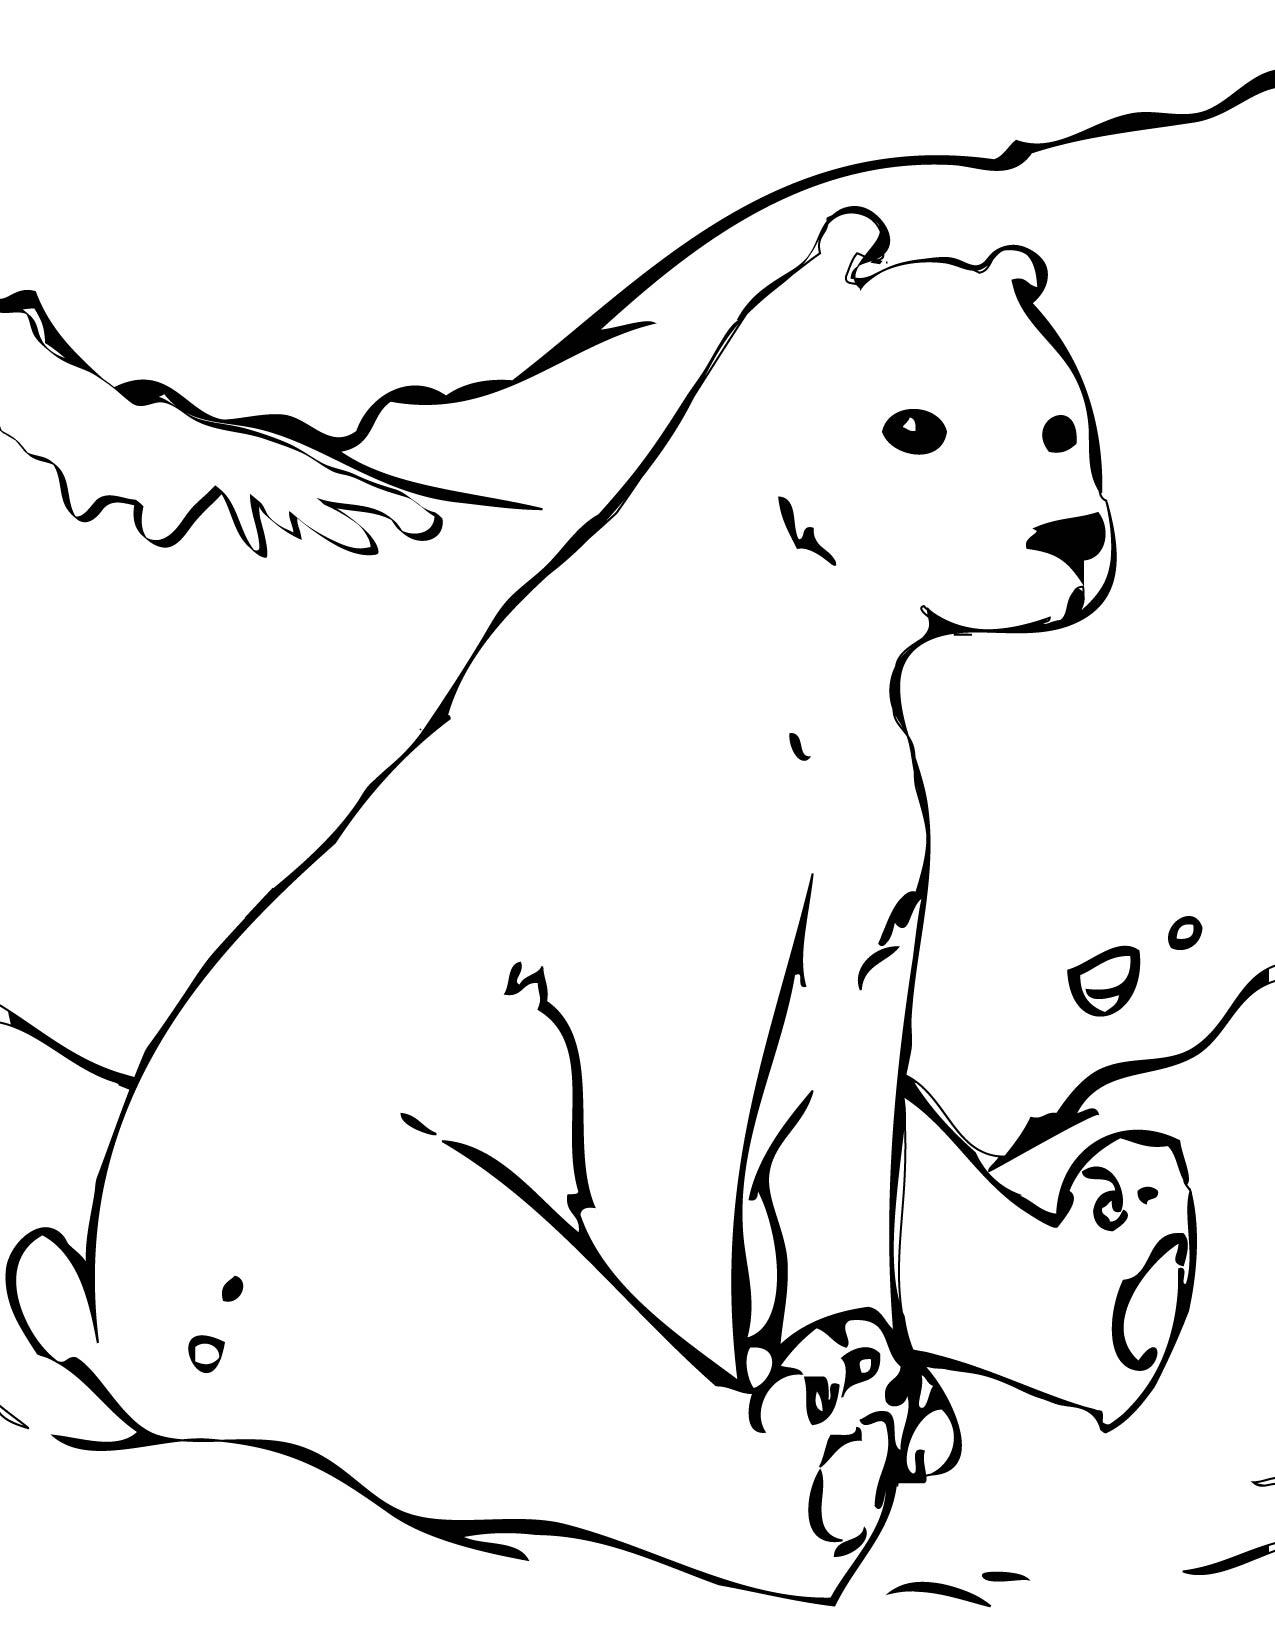 1275x1650 Polar Bear Coloring Pages Unique Free Printable Polar Bear